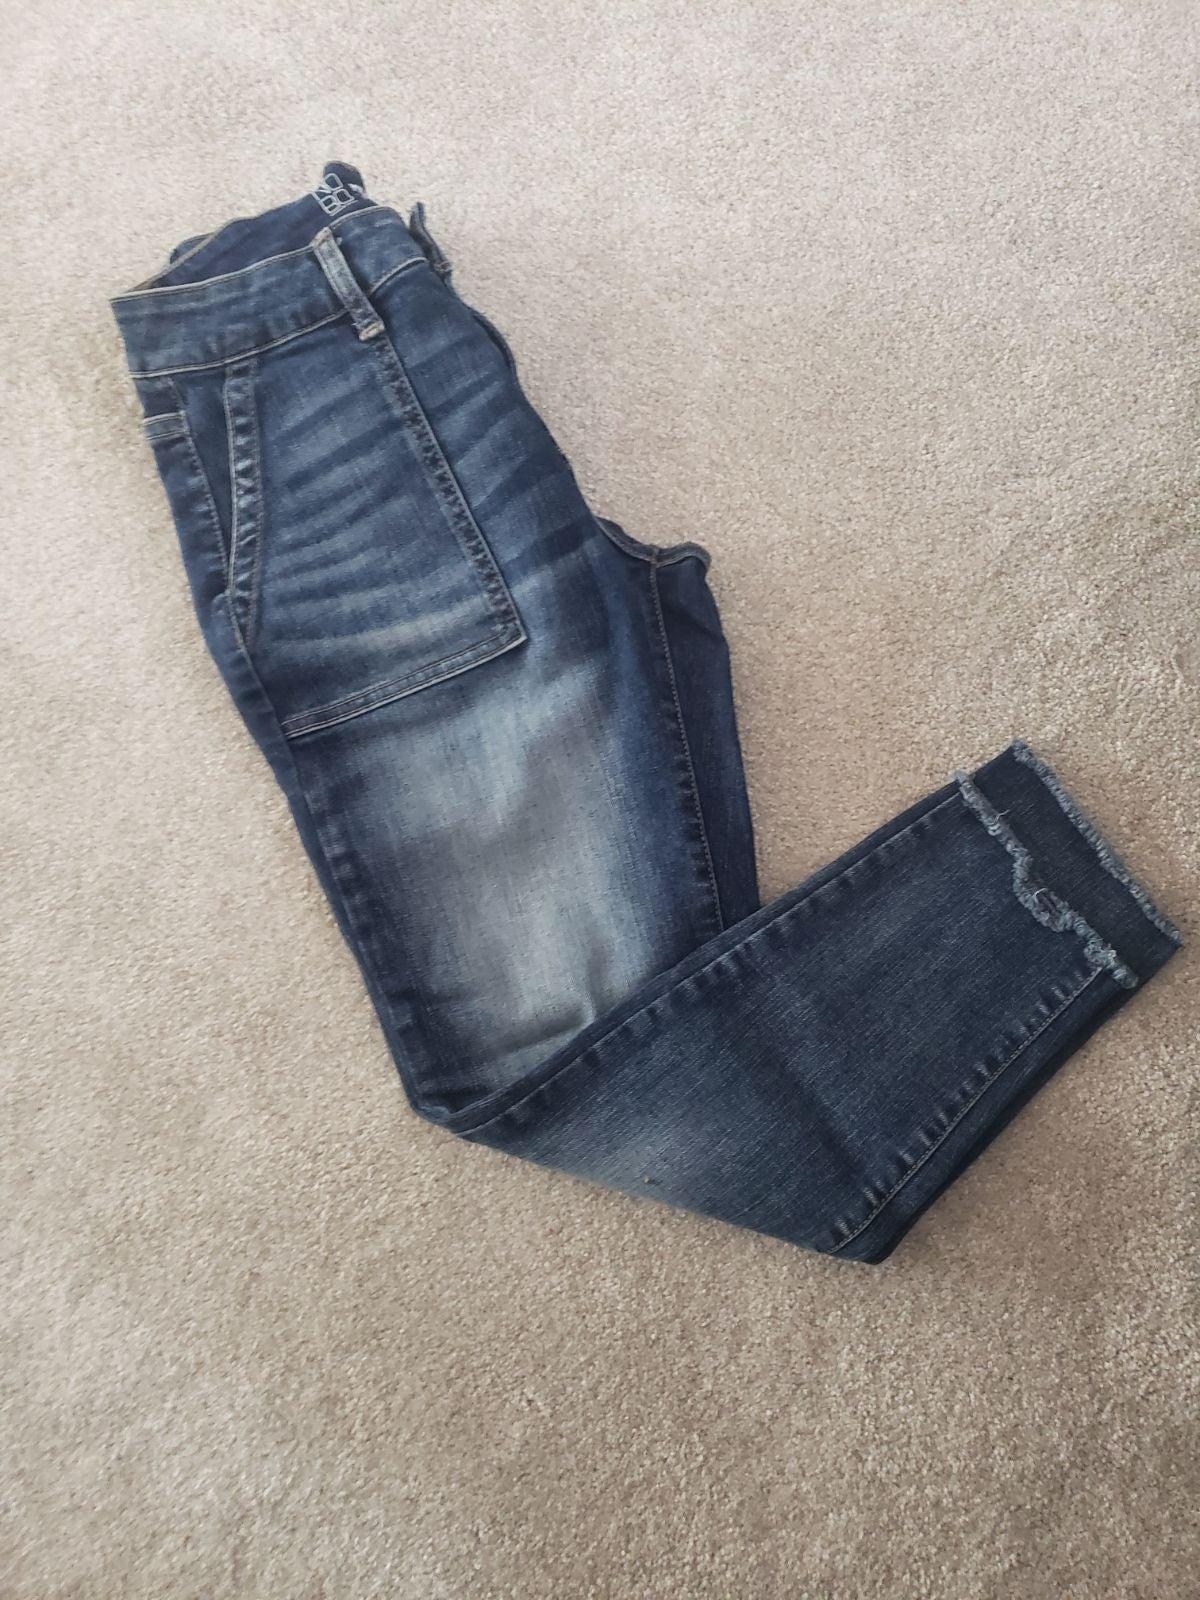 NOBO Jeans Size 5 UNWORN Mid Rise